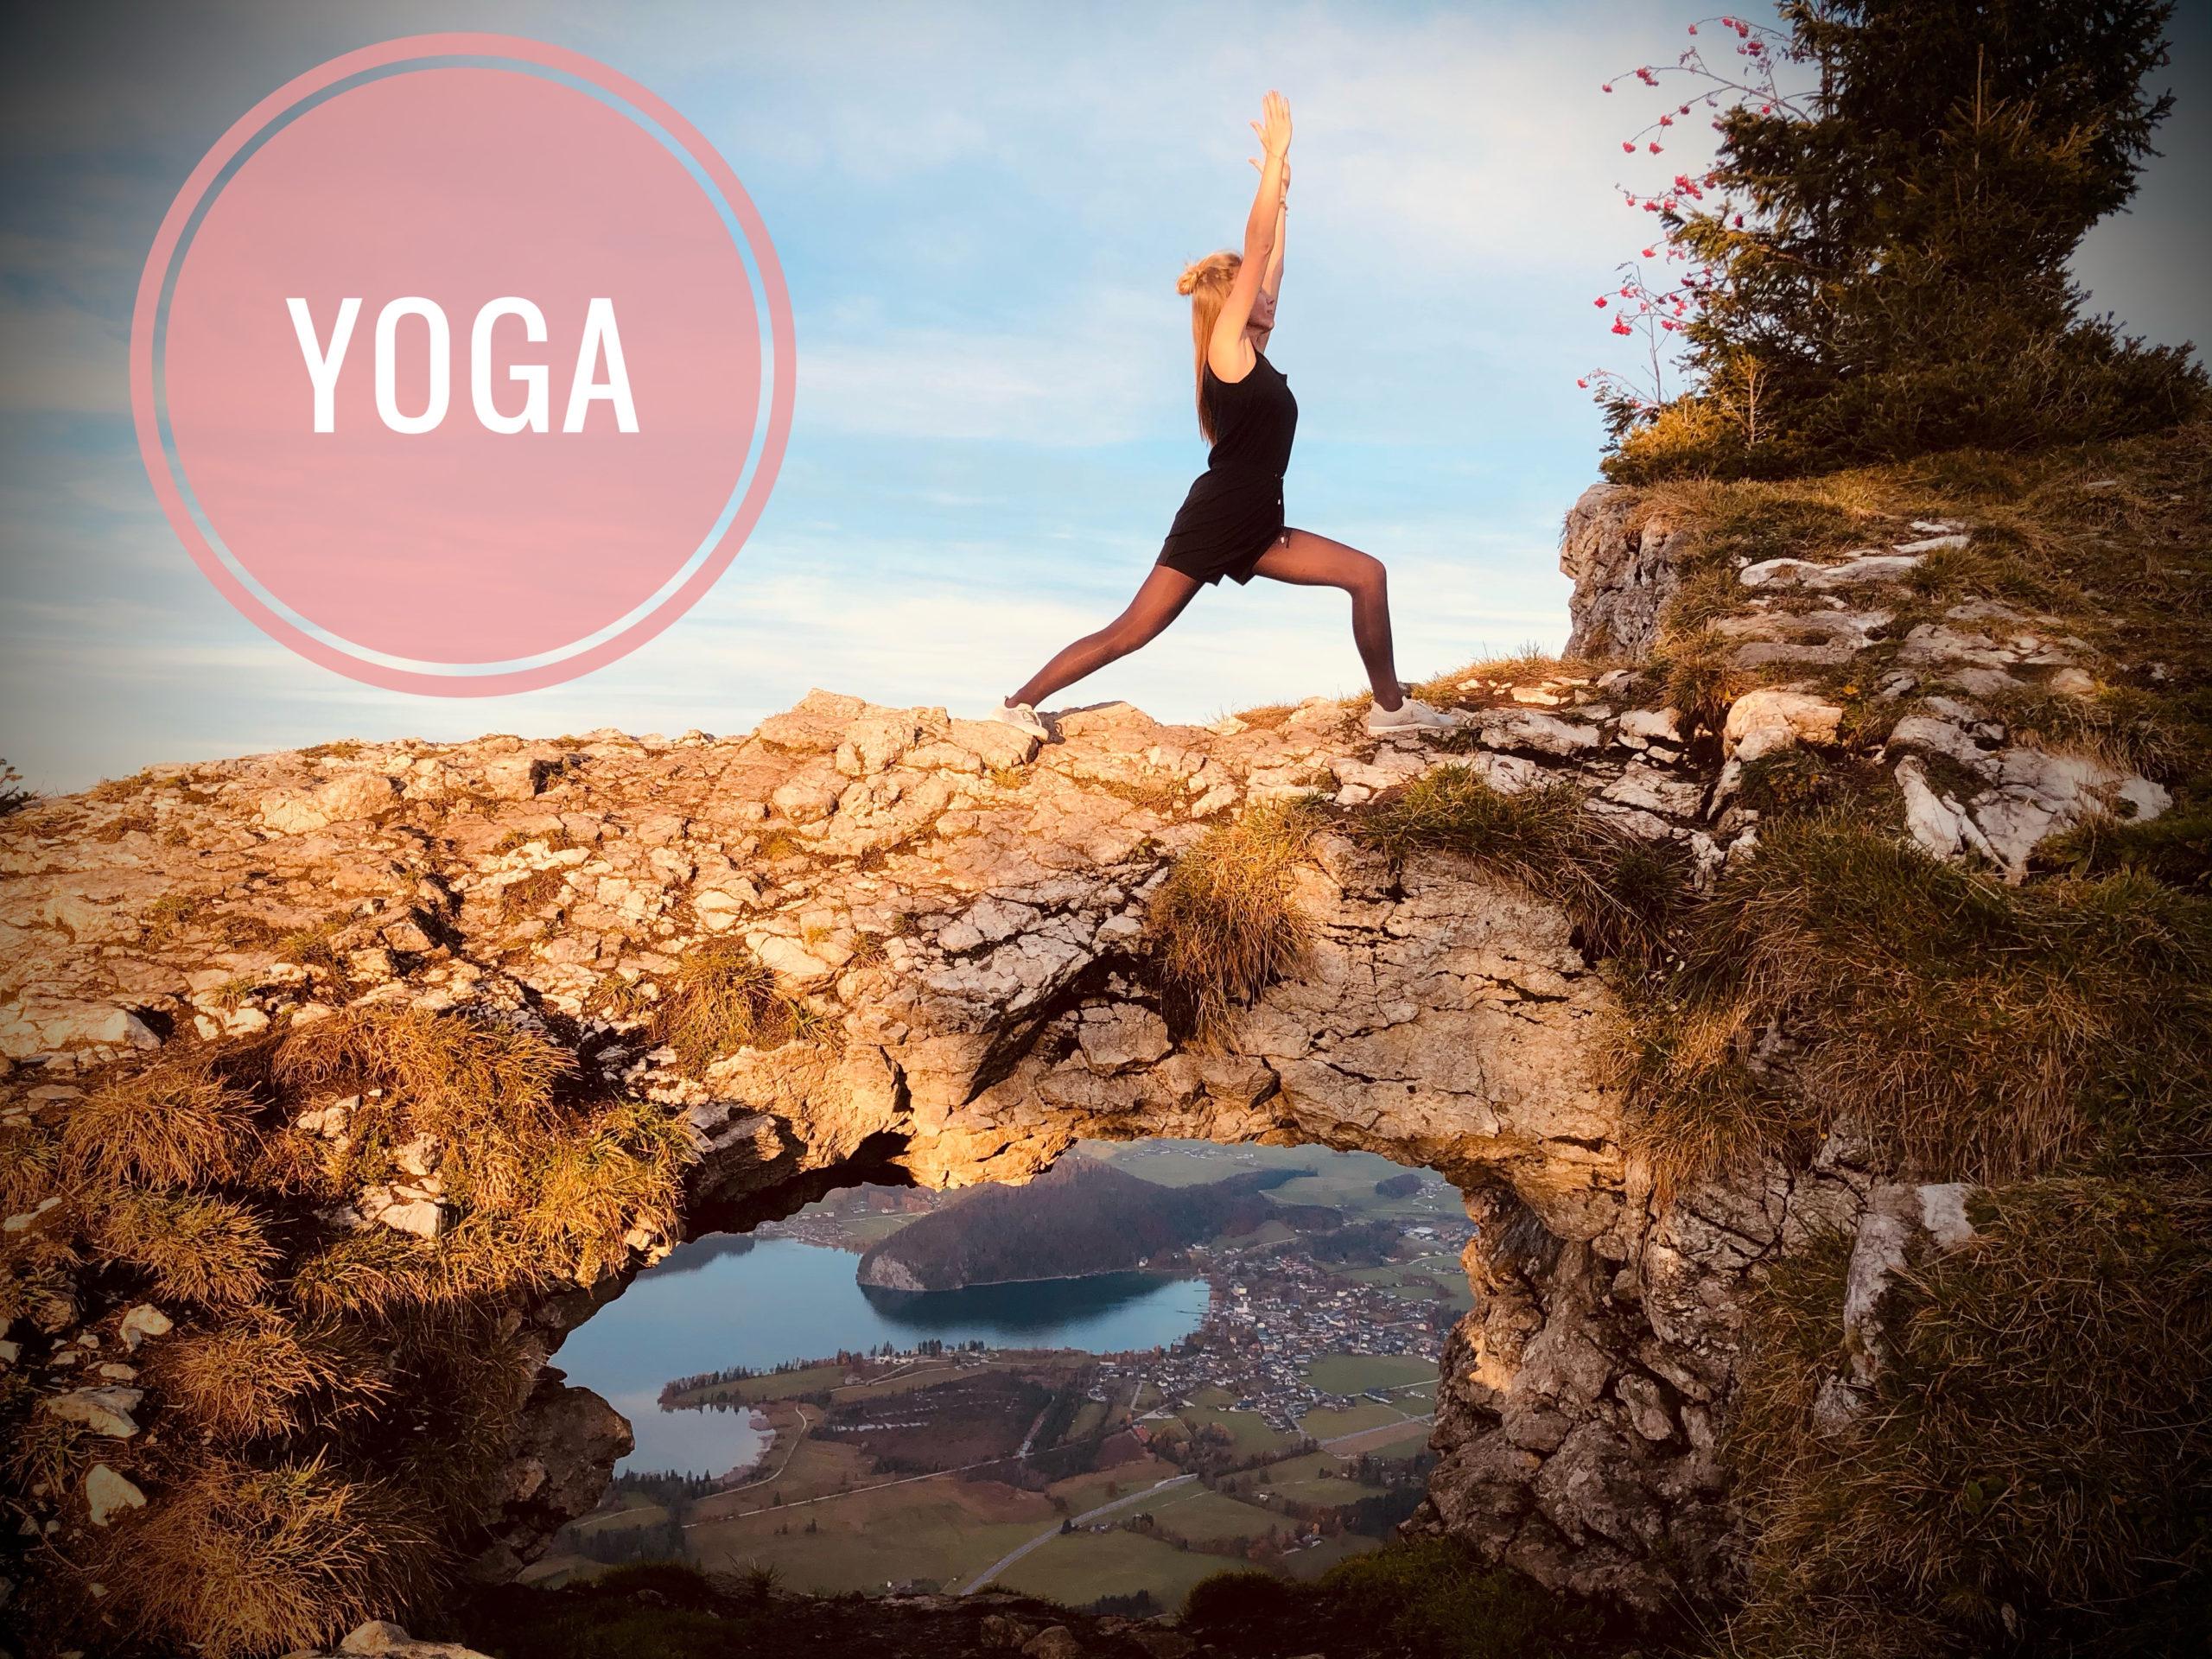 MENTAL & VITAL OÖ goes Yoga online